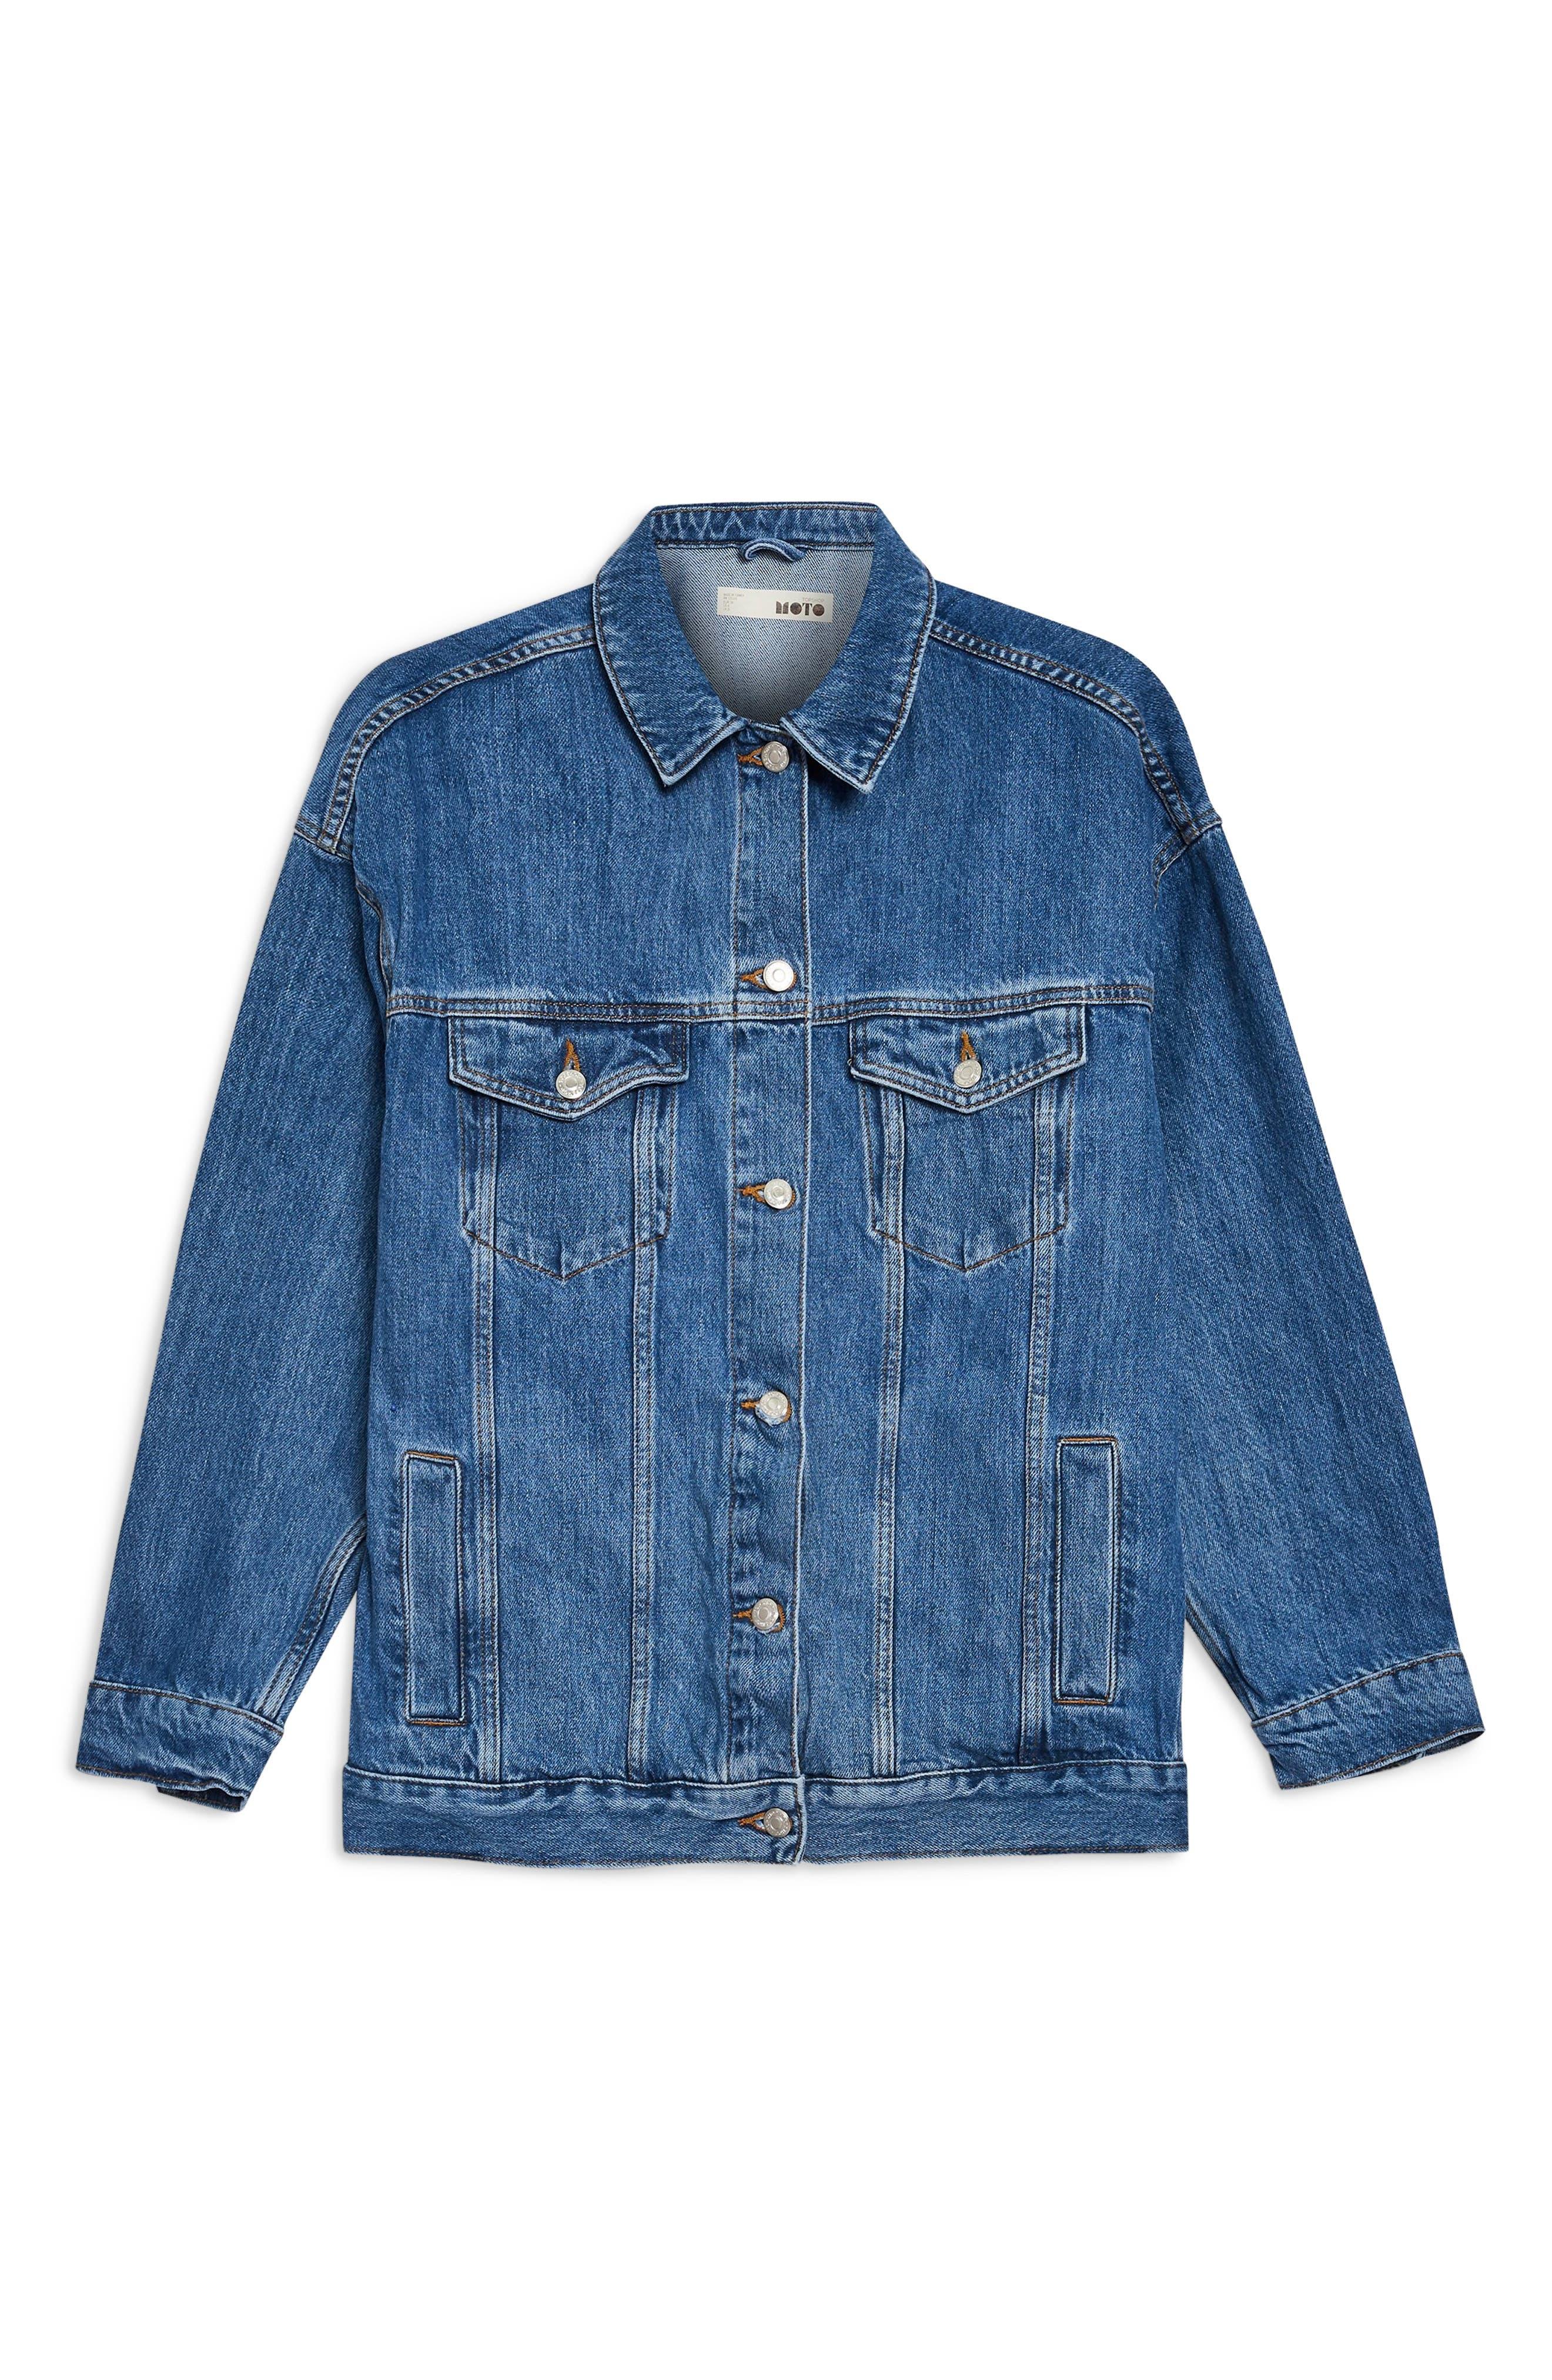 TOPSHOP, Oversized Denim Jacket, Alternate thumbnail 5, color, MID DENIM